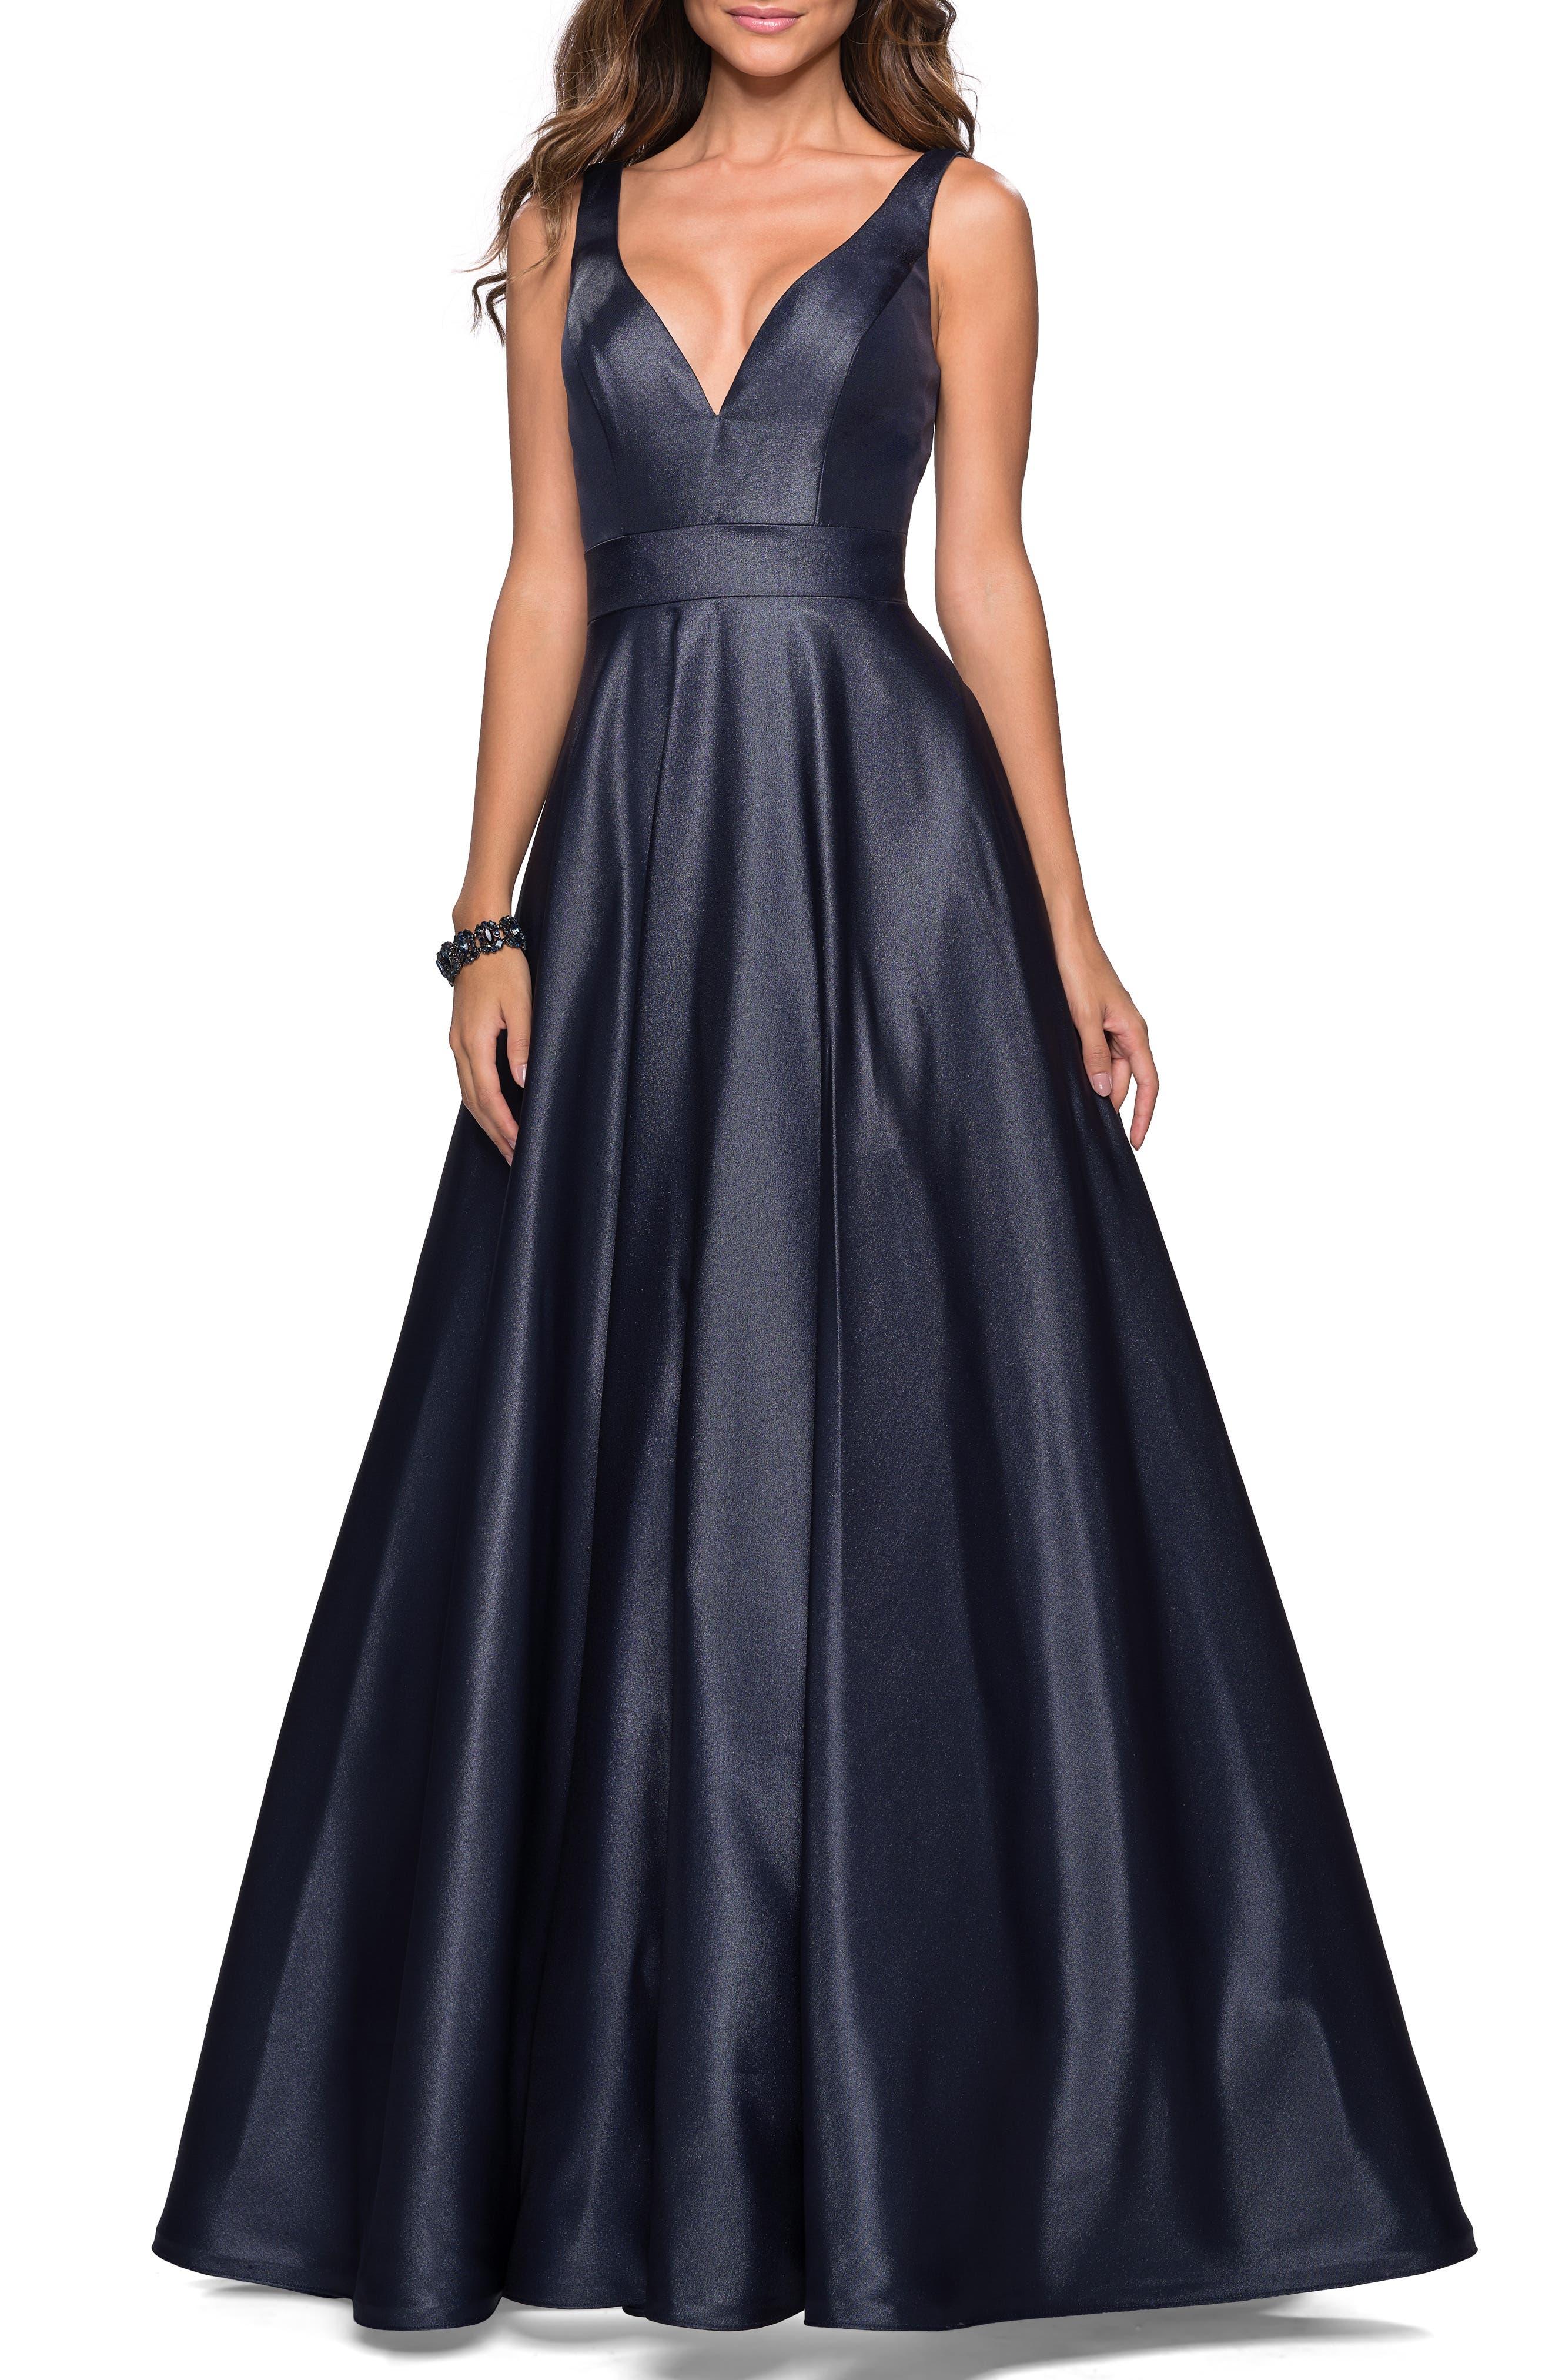 LA FEMME, Mikado Evening Dress, Main thumbnail 1, color, NAVY